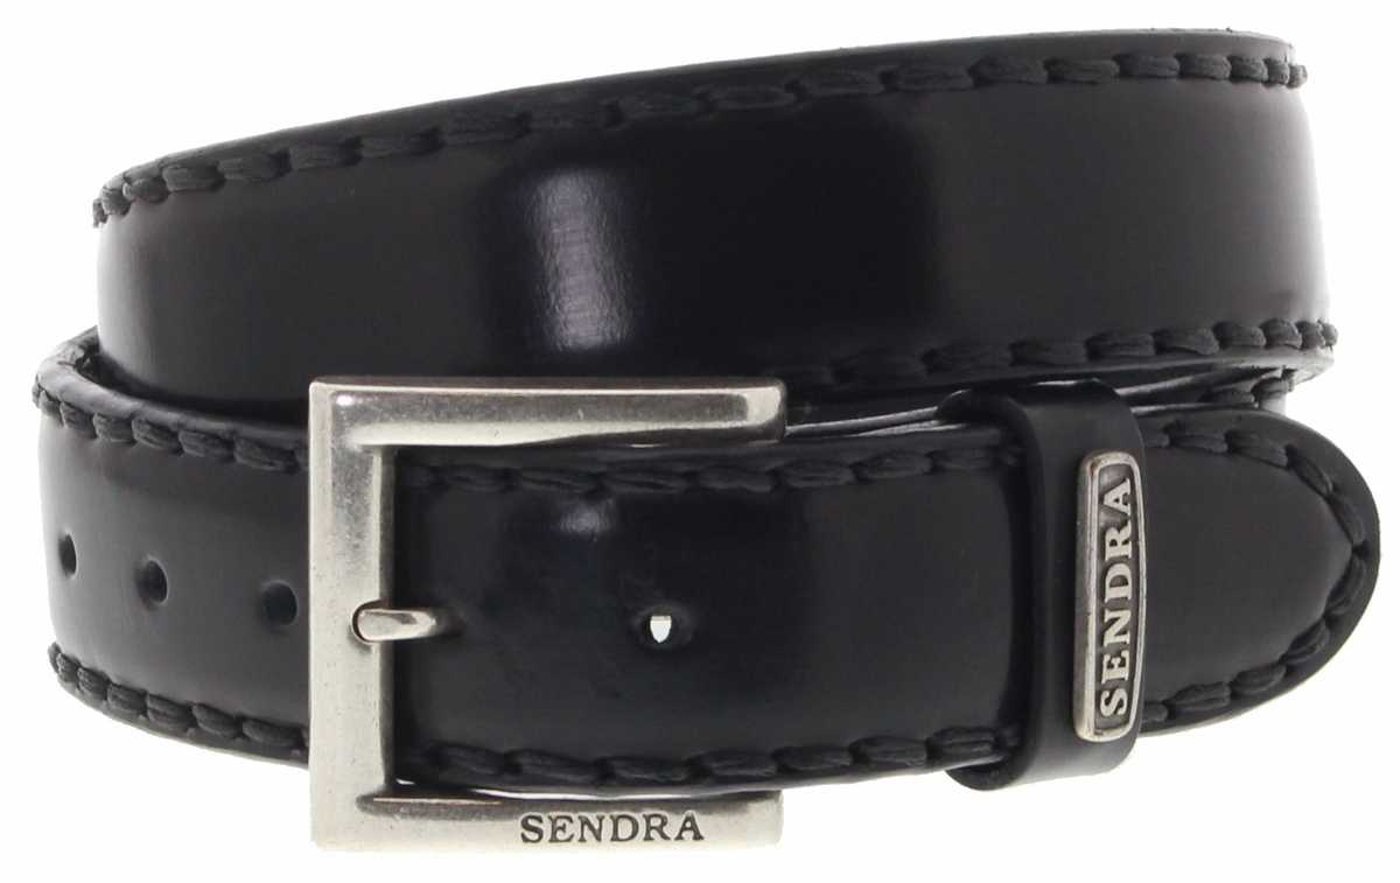 Sendra Boots 8563 Negro Leather Belt - black